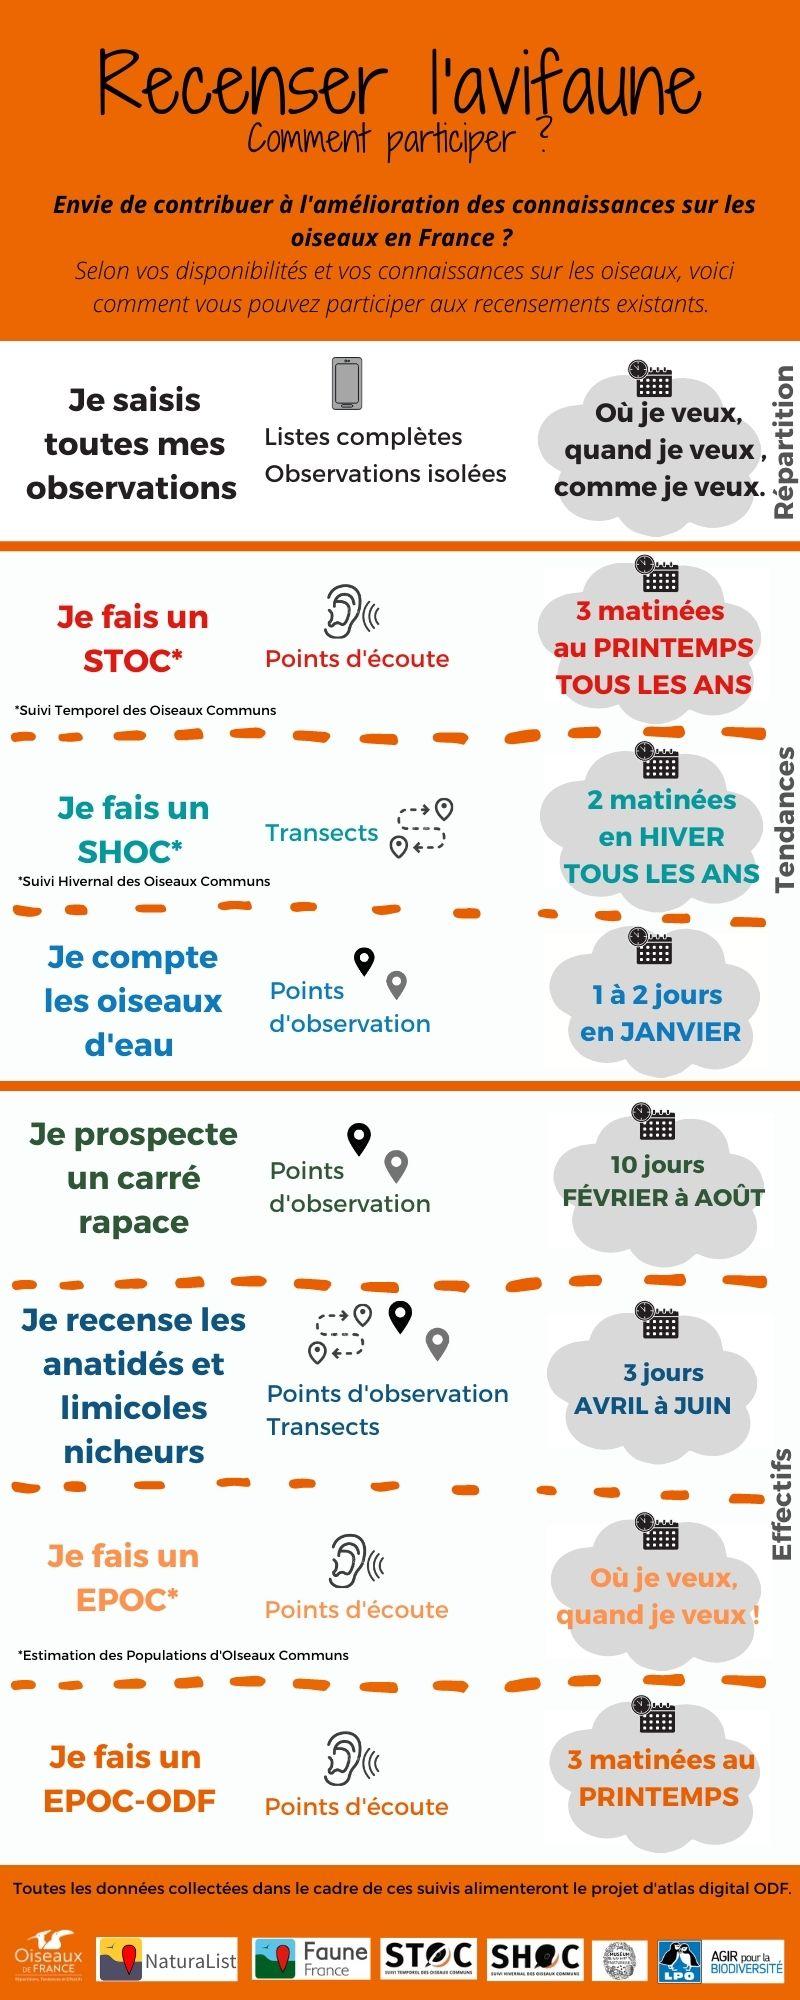 https://cdnfiles1.biolovision.net/www.faune-paca.org/userfiles/MonDossier/OiseauxdeFrance20210225.jpg